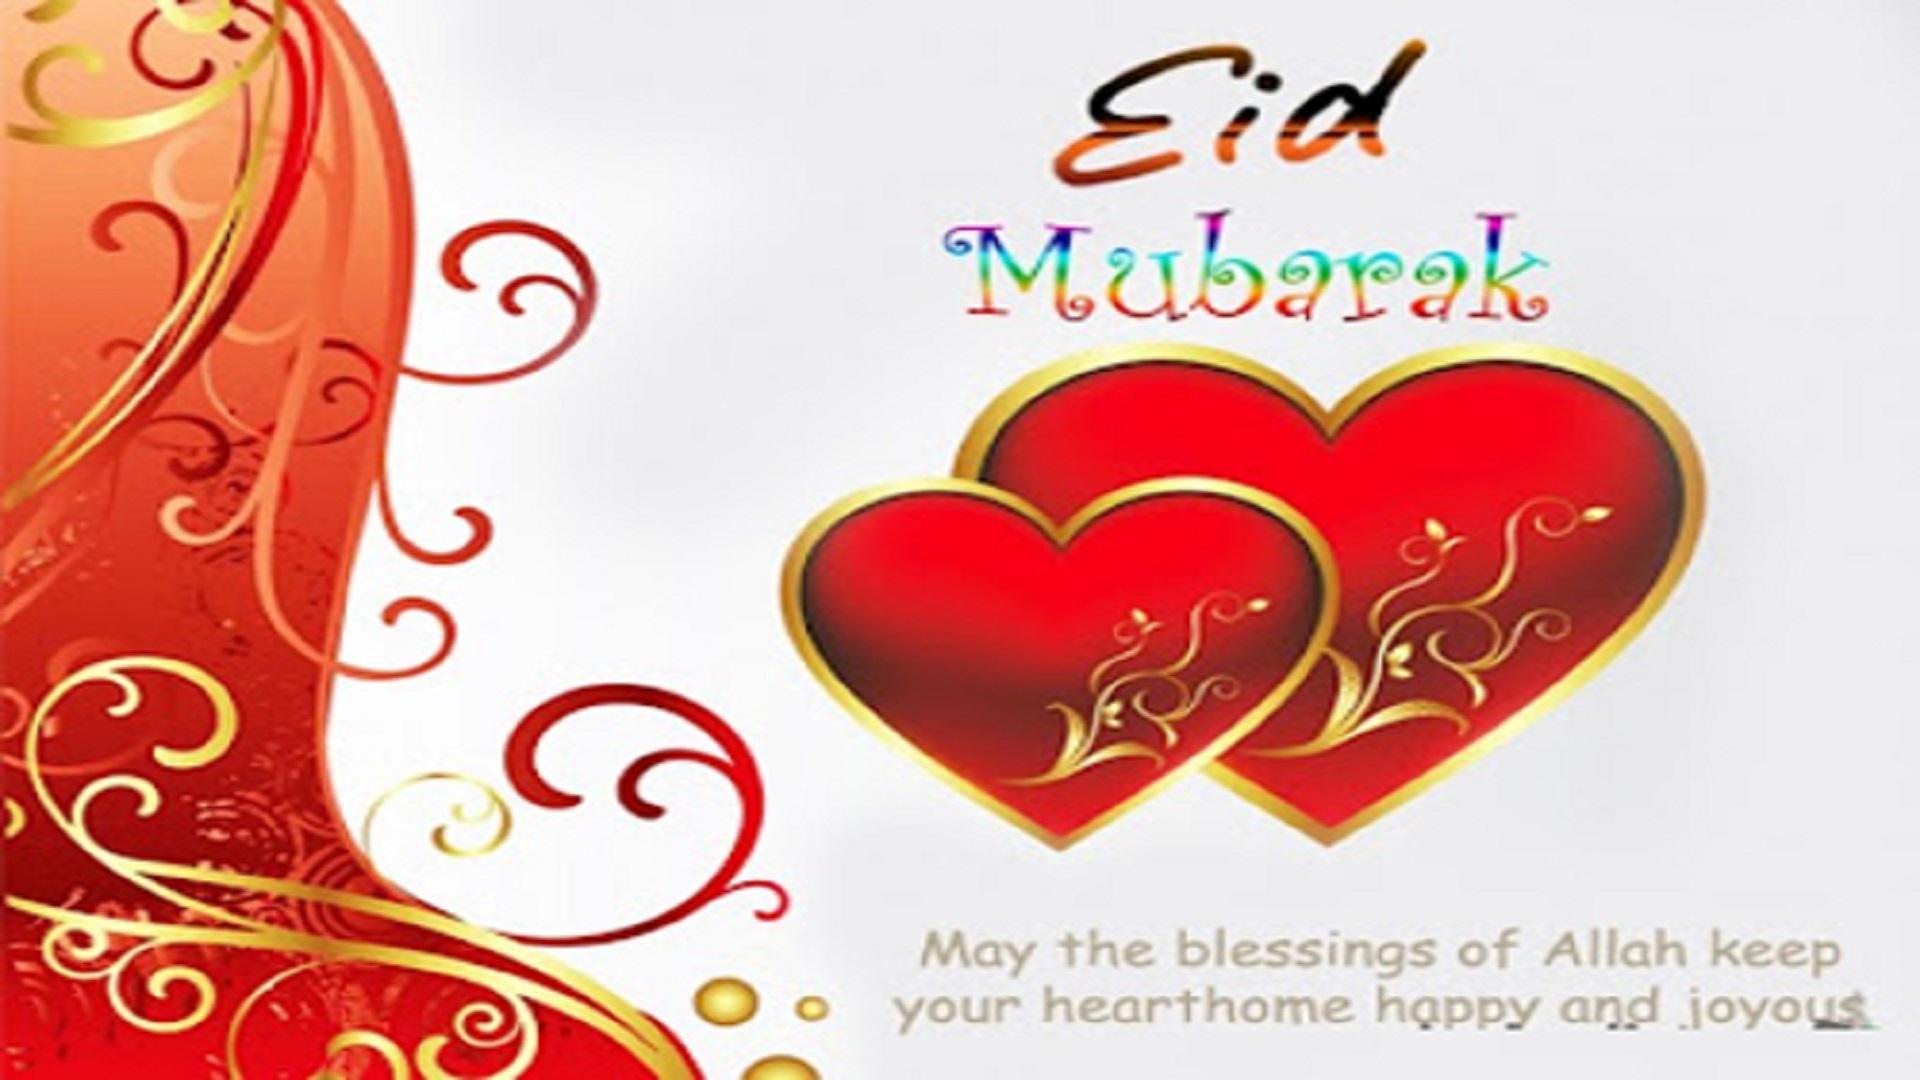 eid-mubarik-hd-free-wallpapers